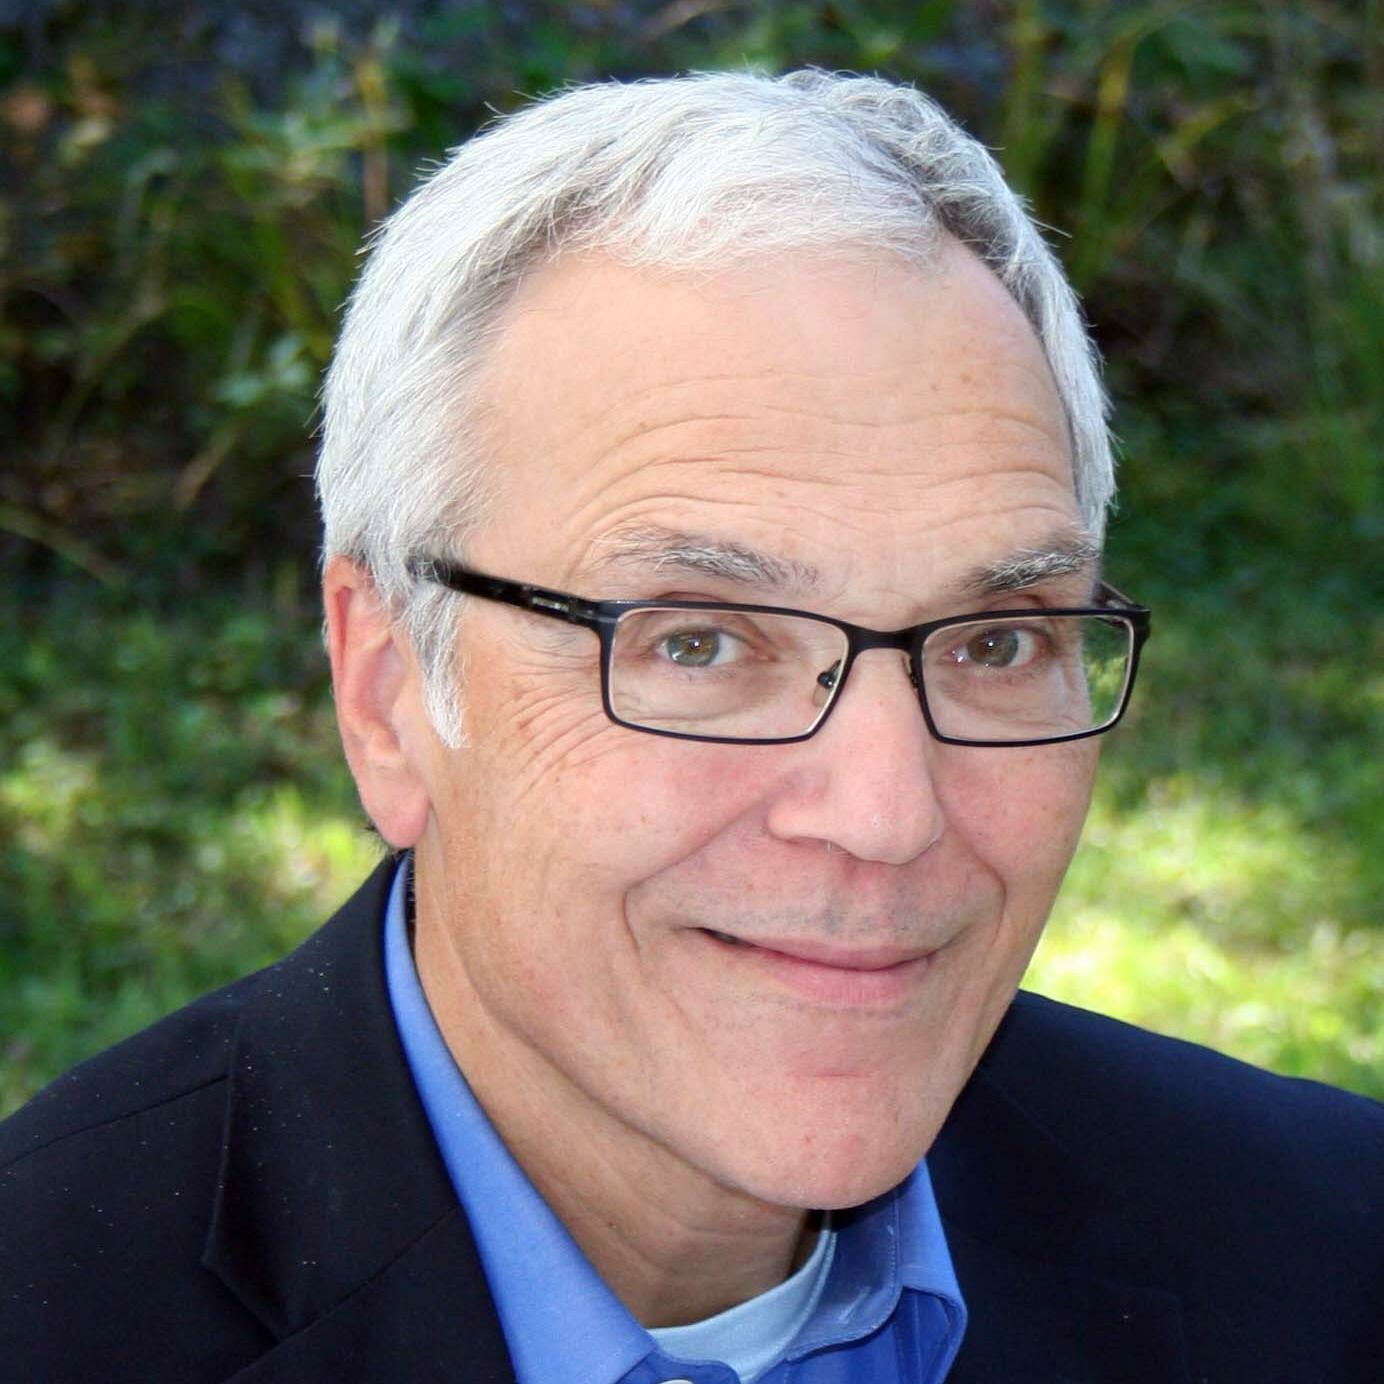 Samuel Gerber